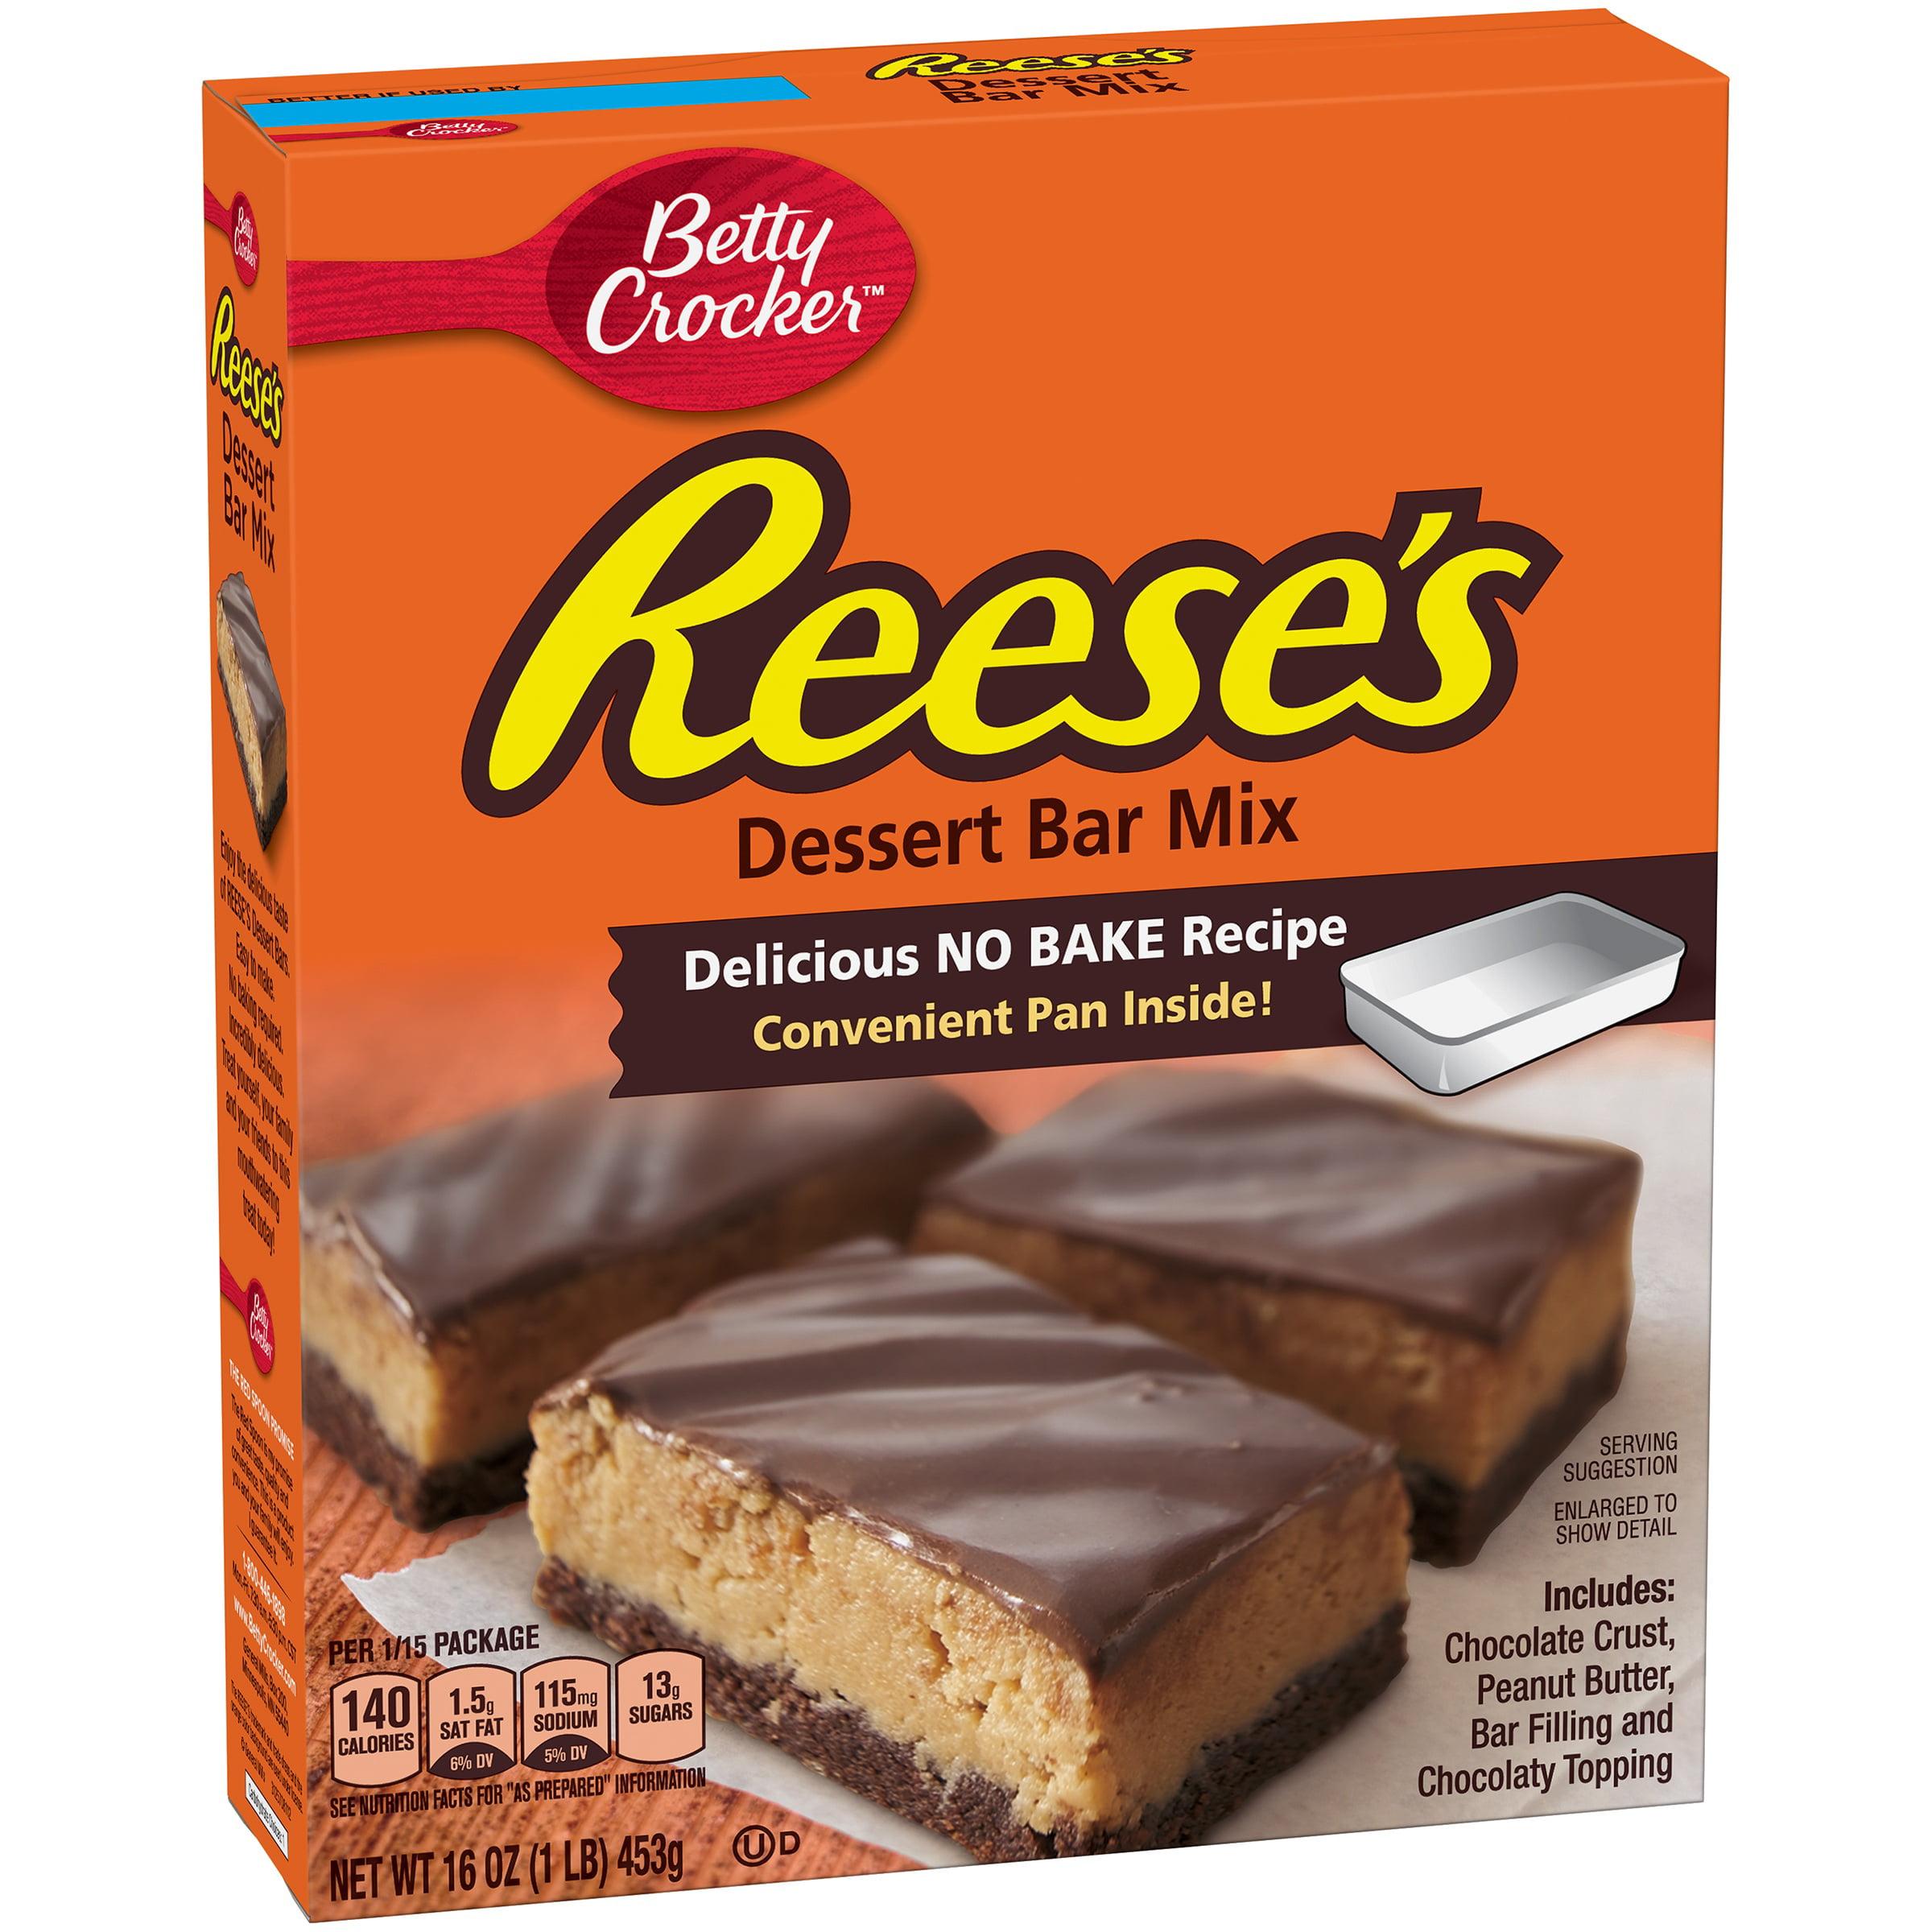 Betty Crocker Hershey's Dessert Bar Mix Reese's No Bake Recipe 16.0 oz Box by General Mills Sales, Inc.